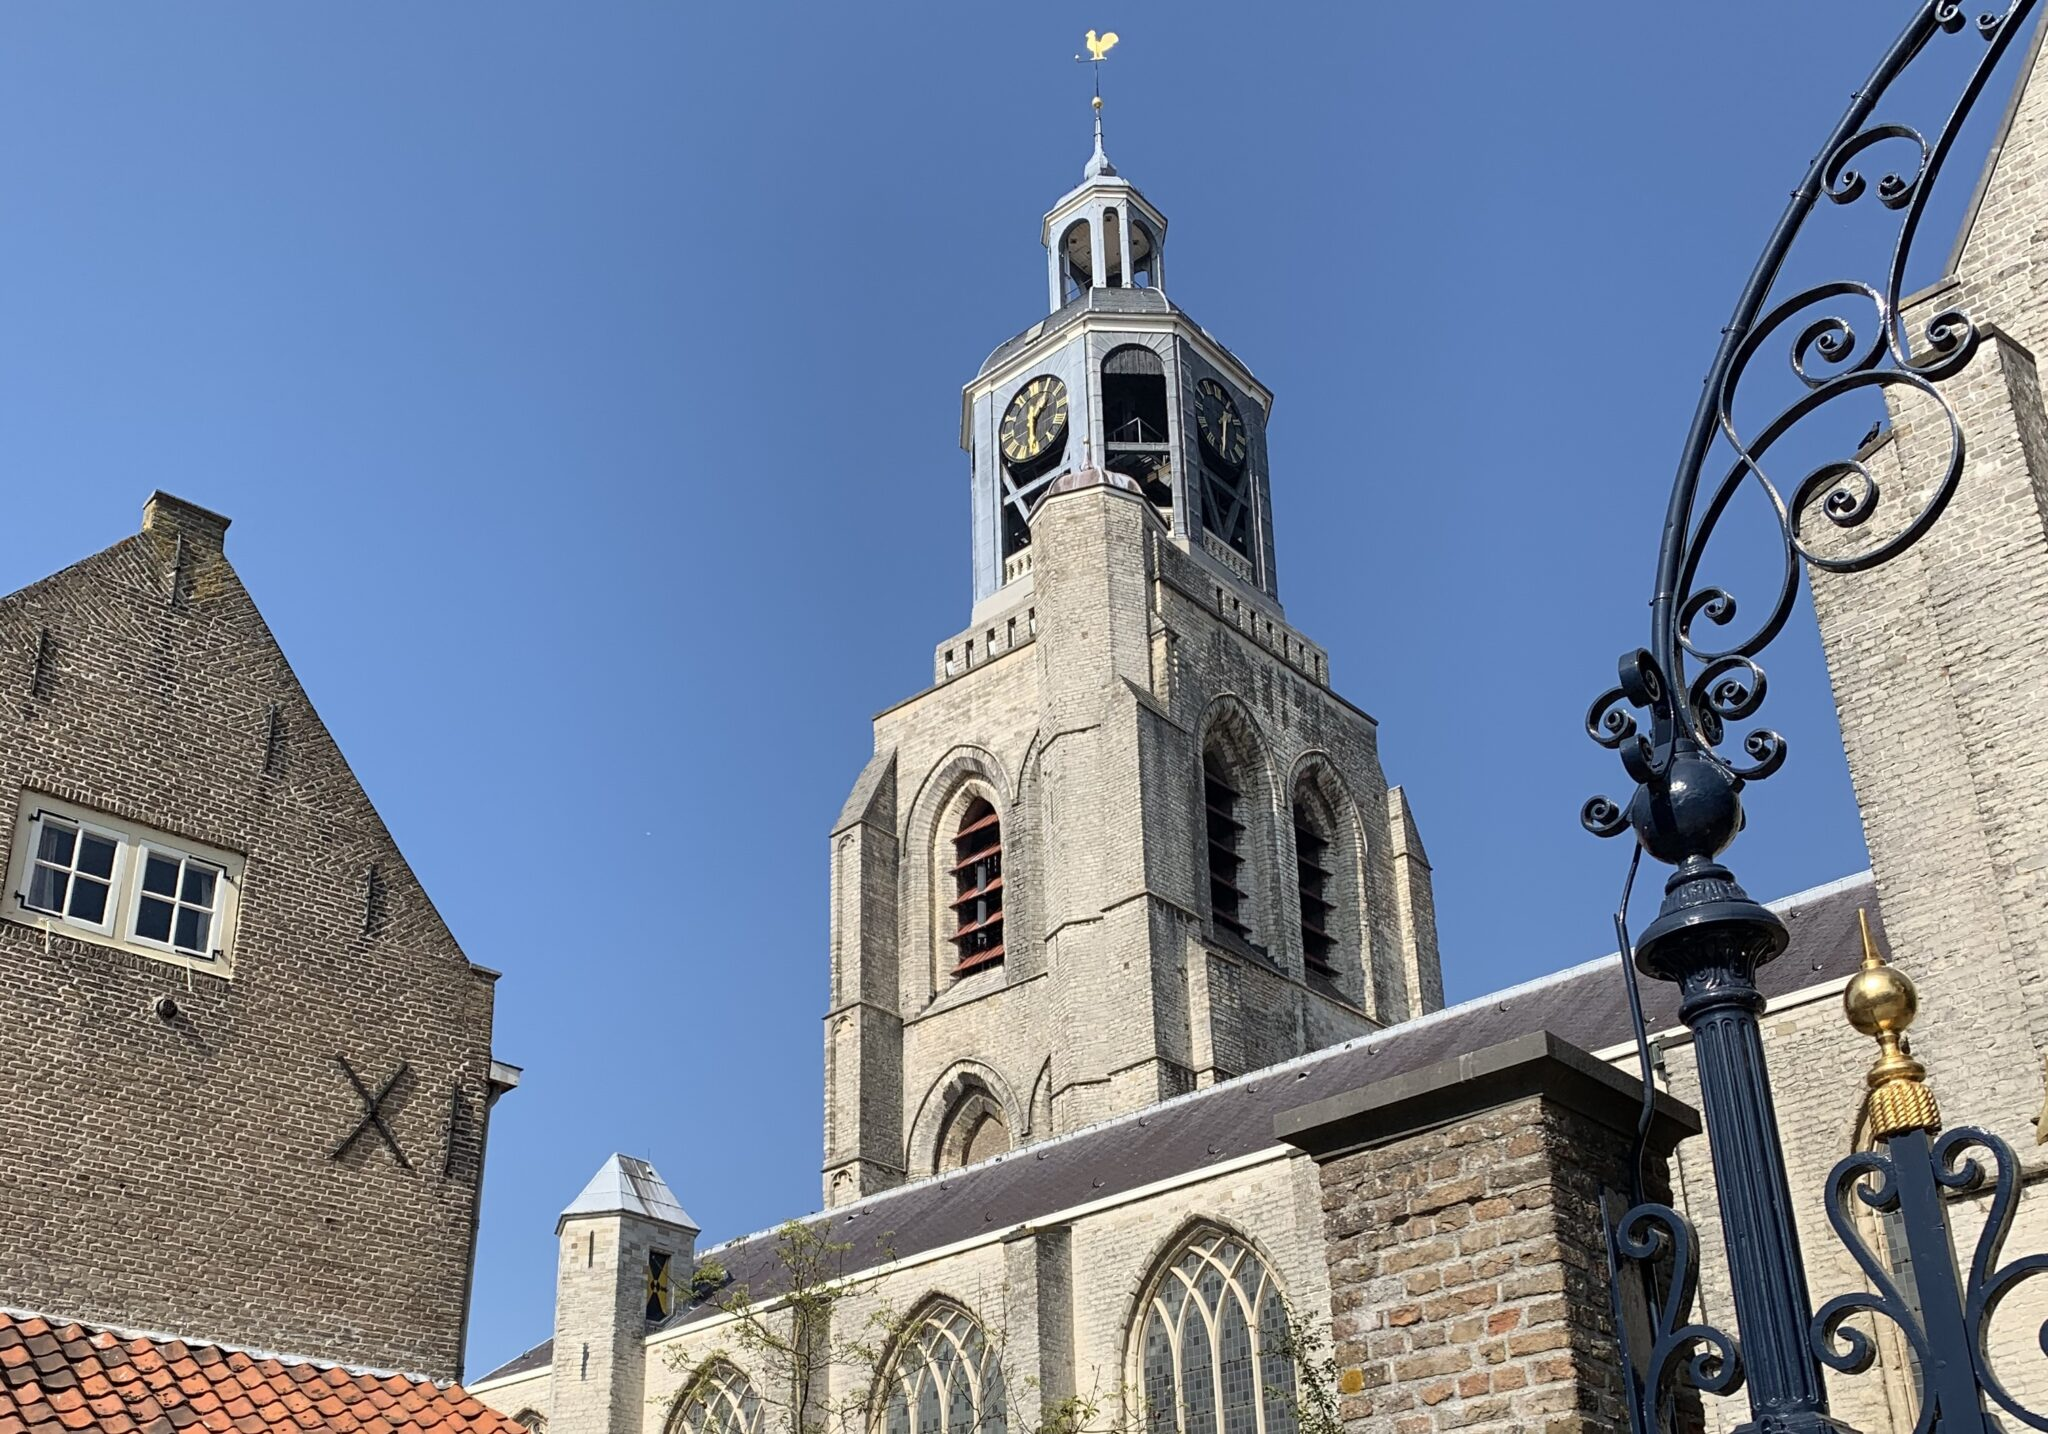 blauwe lucht zonnig zon sint gertrudiskerk peperbus kerk toren klok